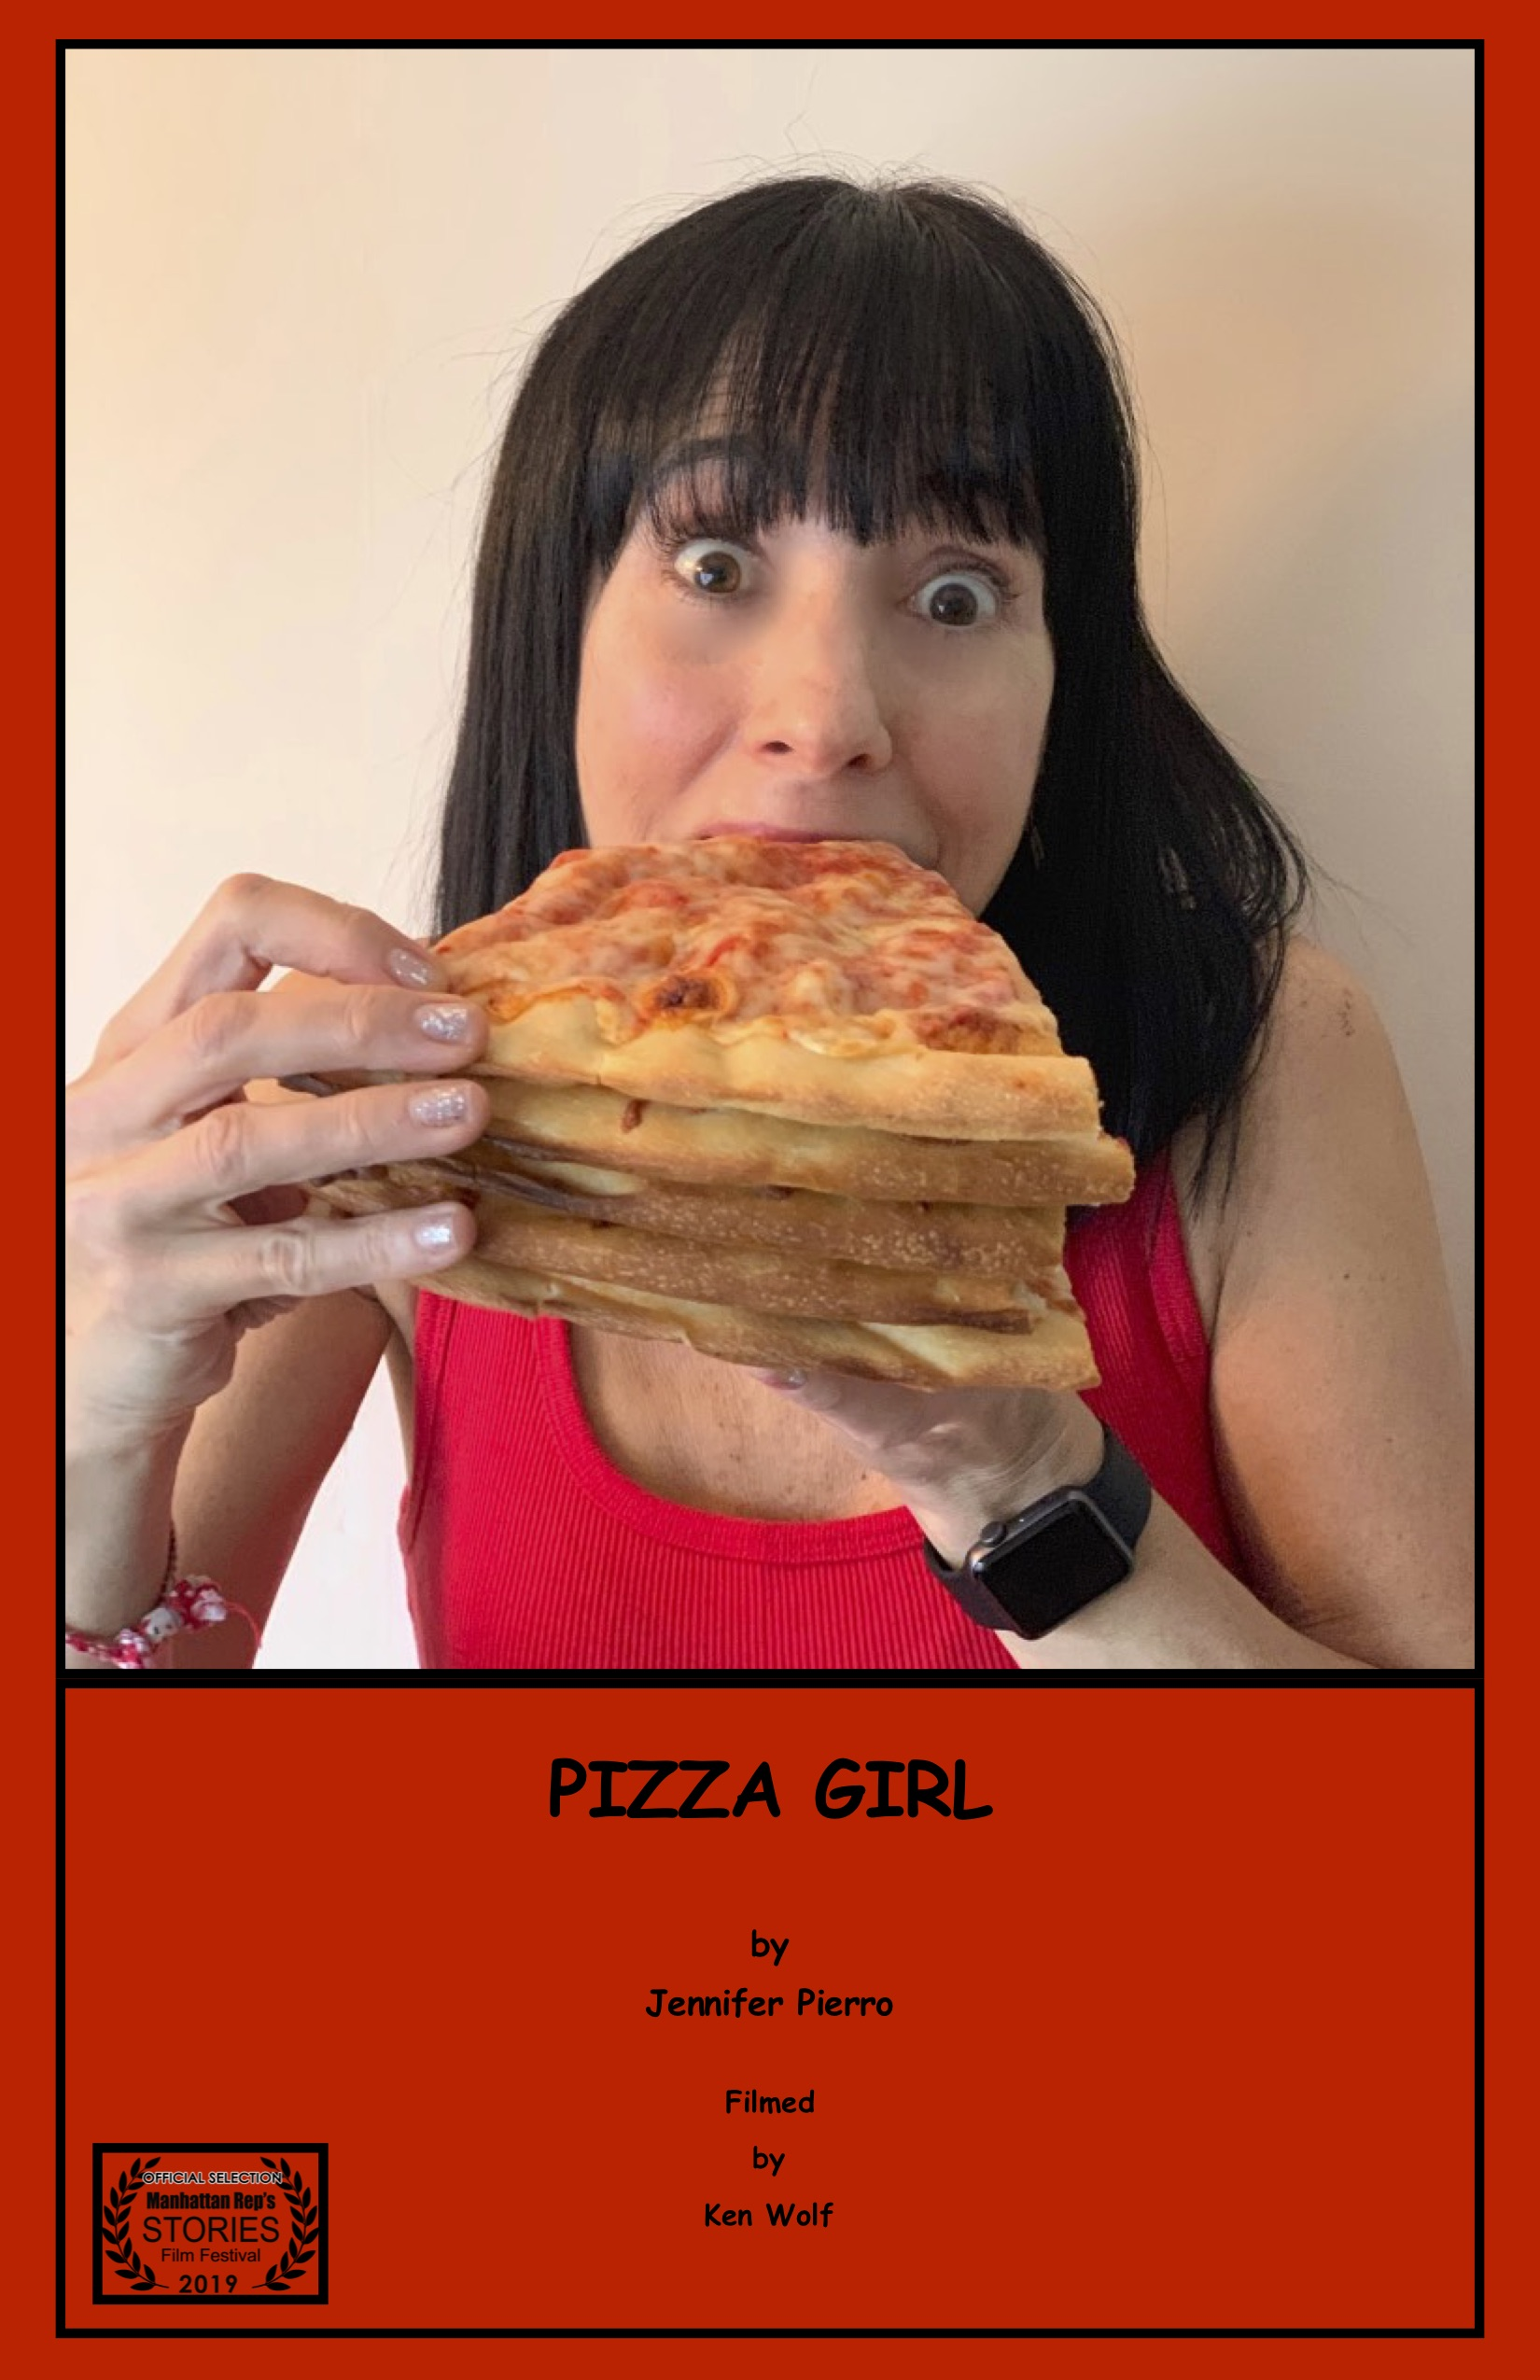 Pizza Girl Film Poster by Jennifer Pierro for my website jpeg.jpg